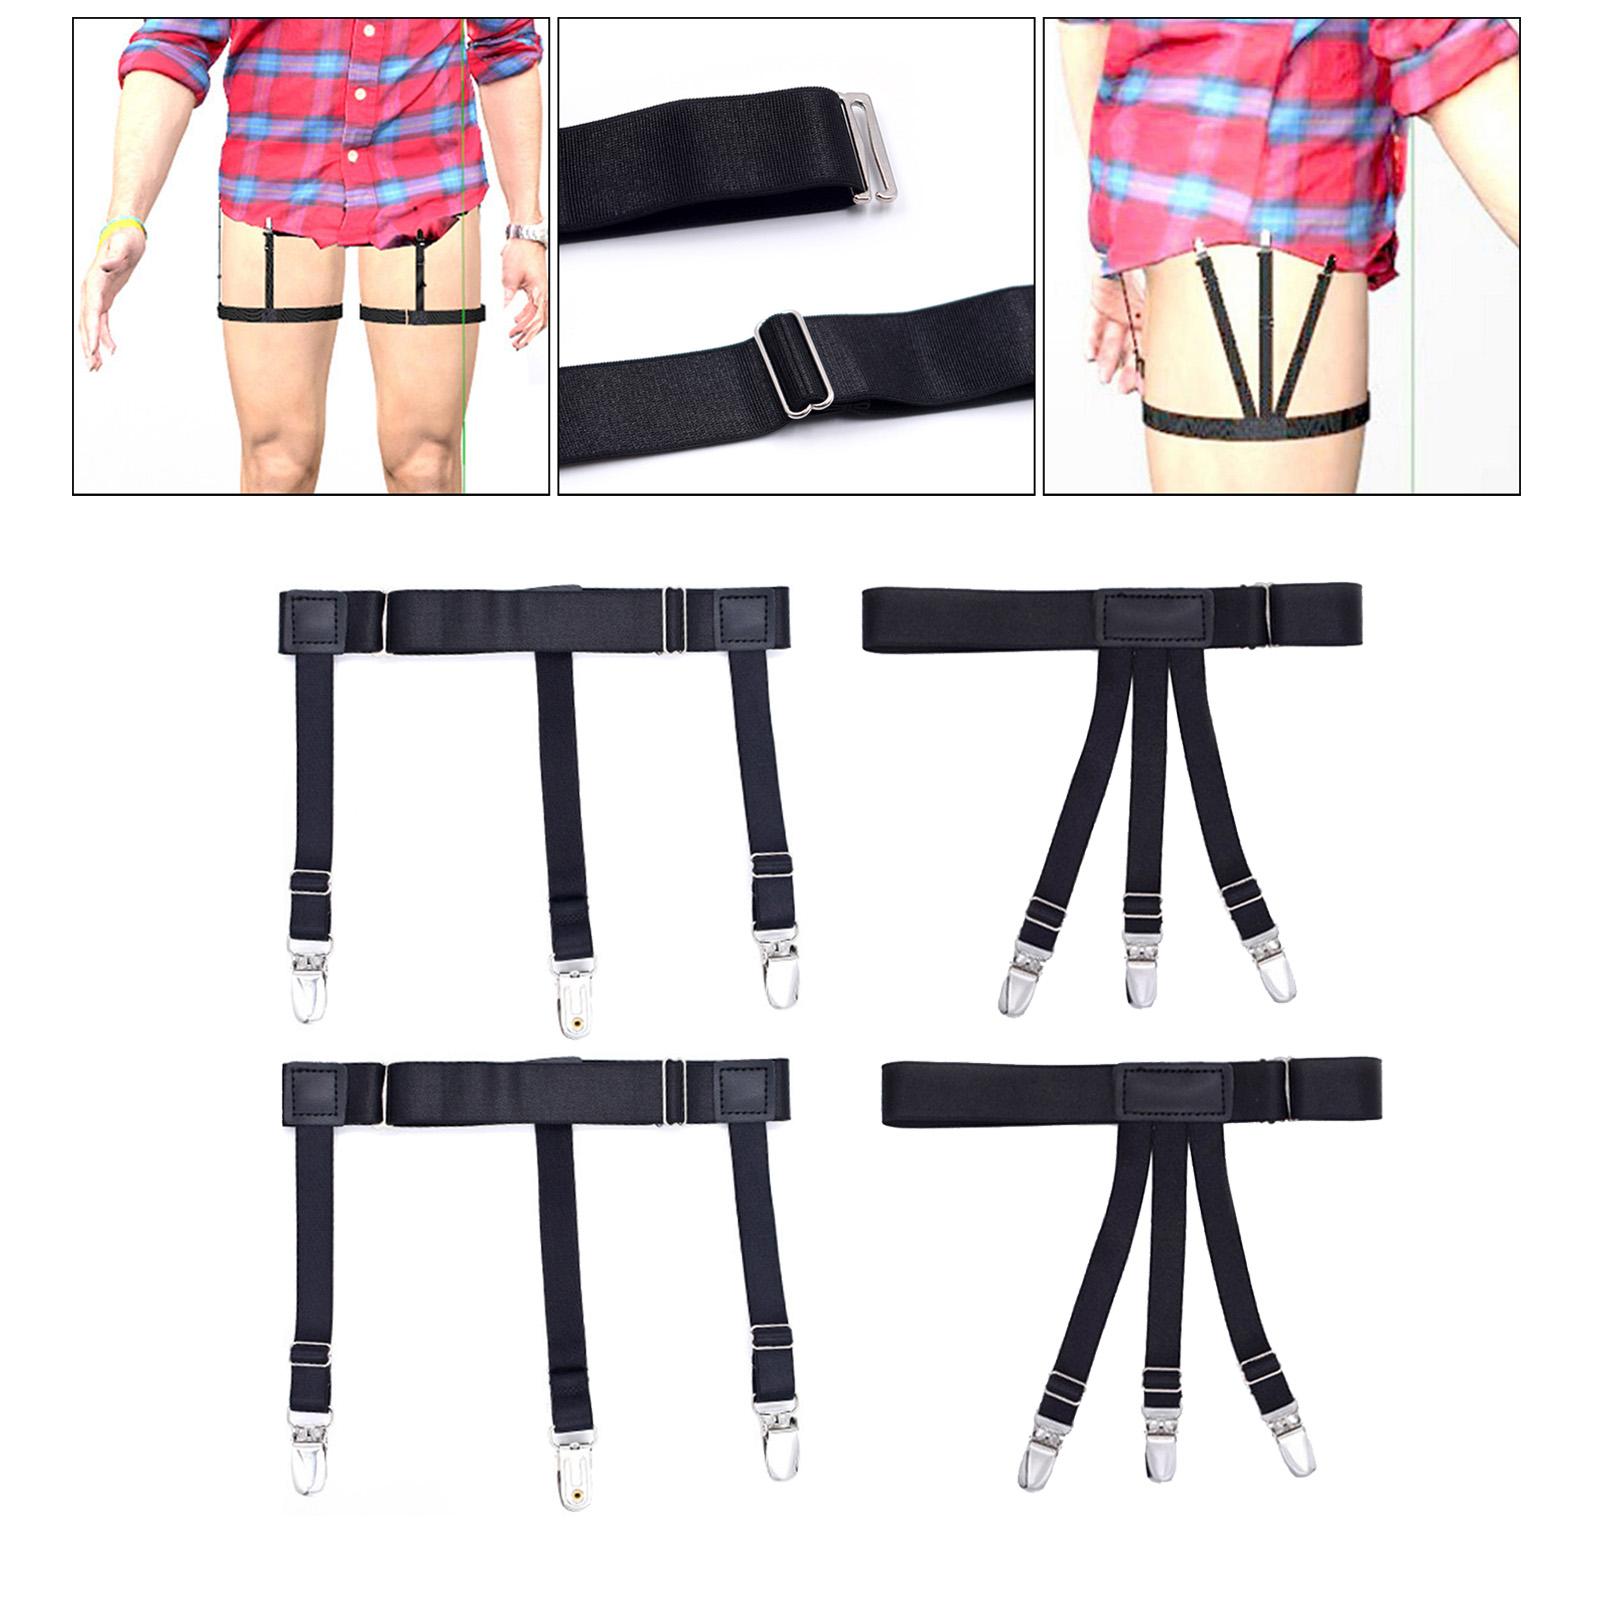 2x Shirt Stays Leg Garter Thigh Suspender Holders Non-Slip Clamps Military